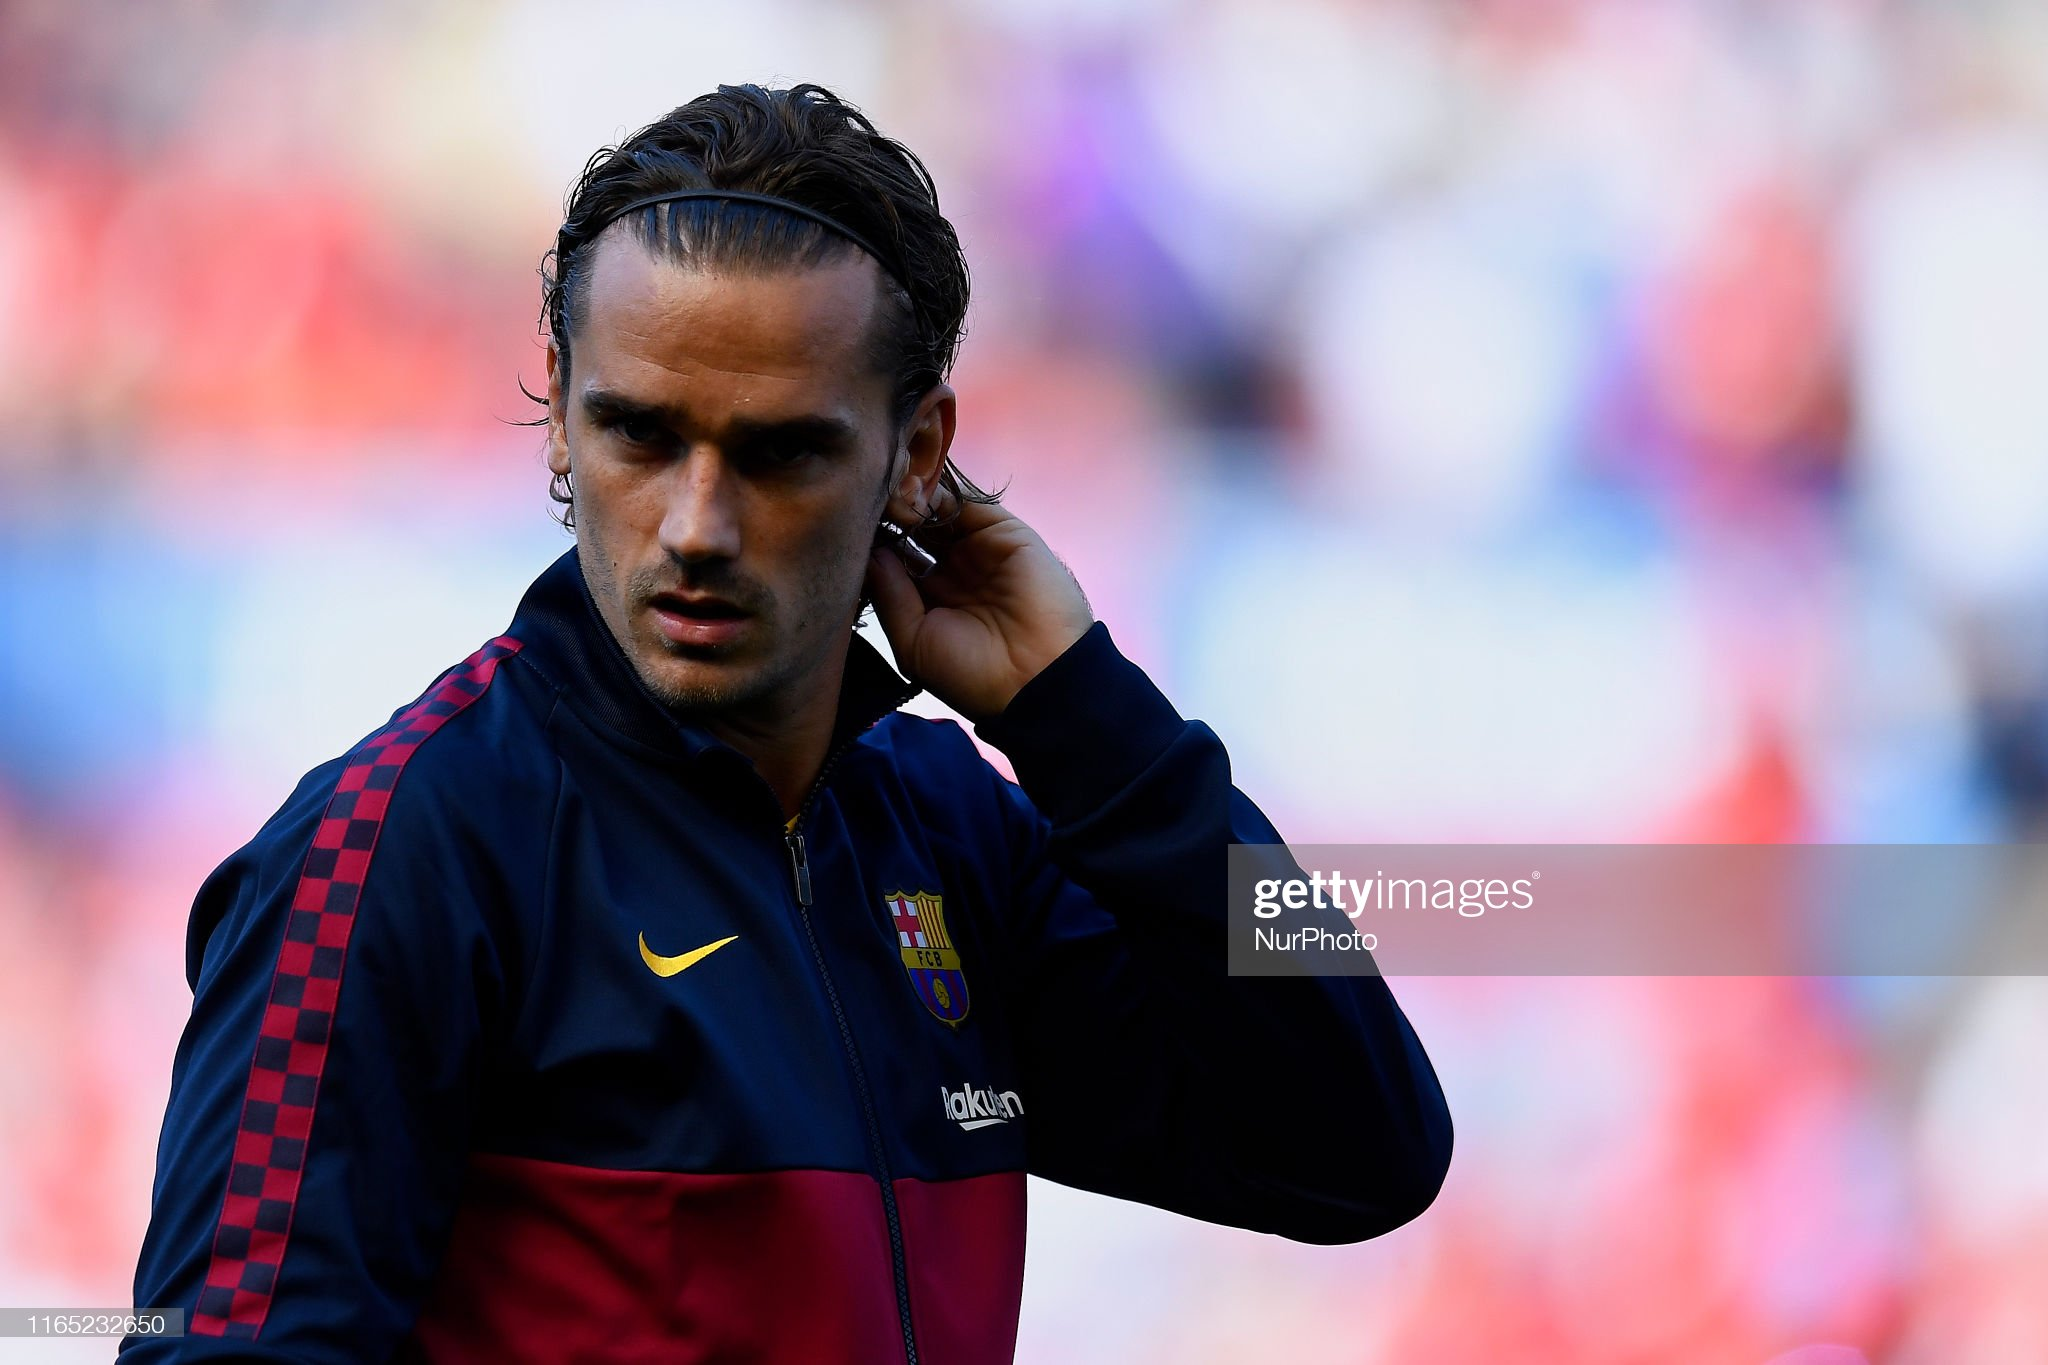 صور مباراة : أوساسونا - برشلونة 2-2 ( 31-08-2019 )  Antoine-griezmann-of-barcelona-during-the-liga-match-between-ca-and-picture-id1165232650?s=2048x2048